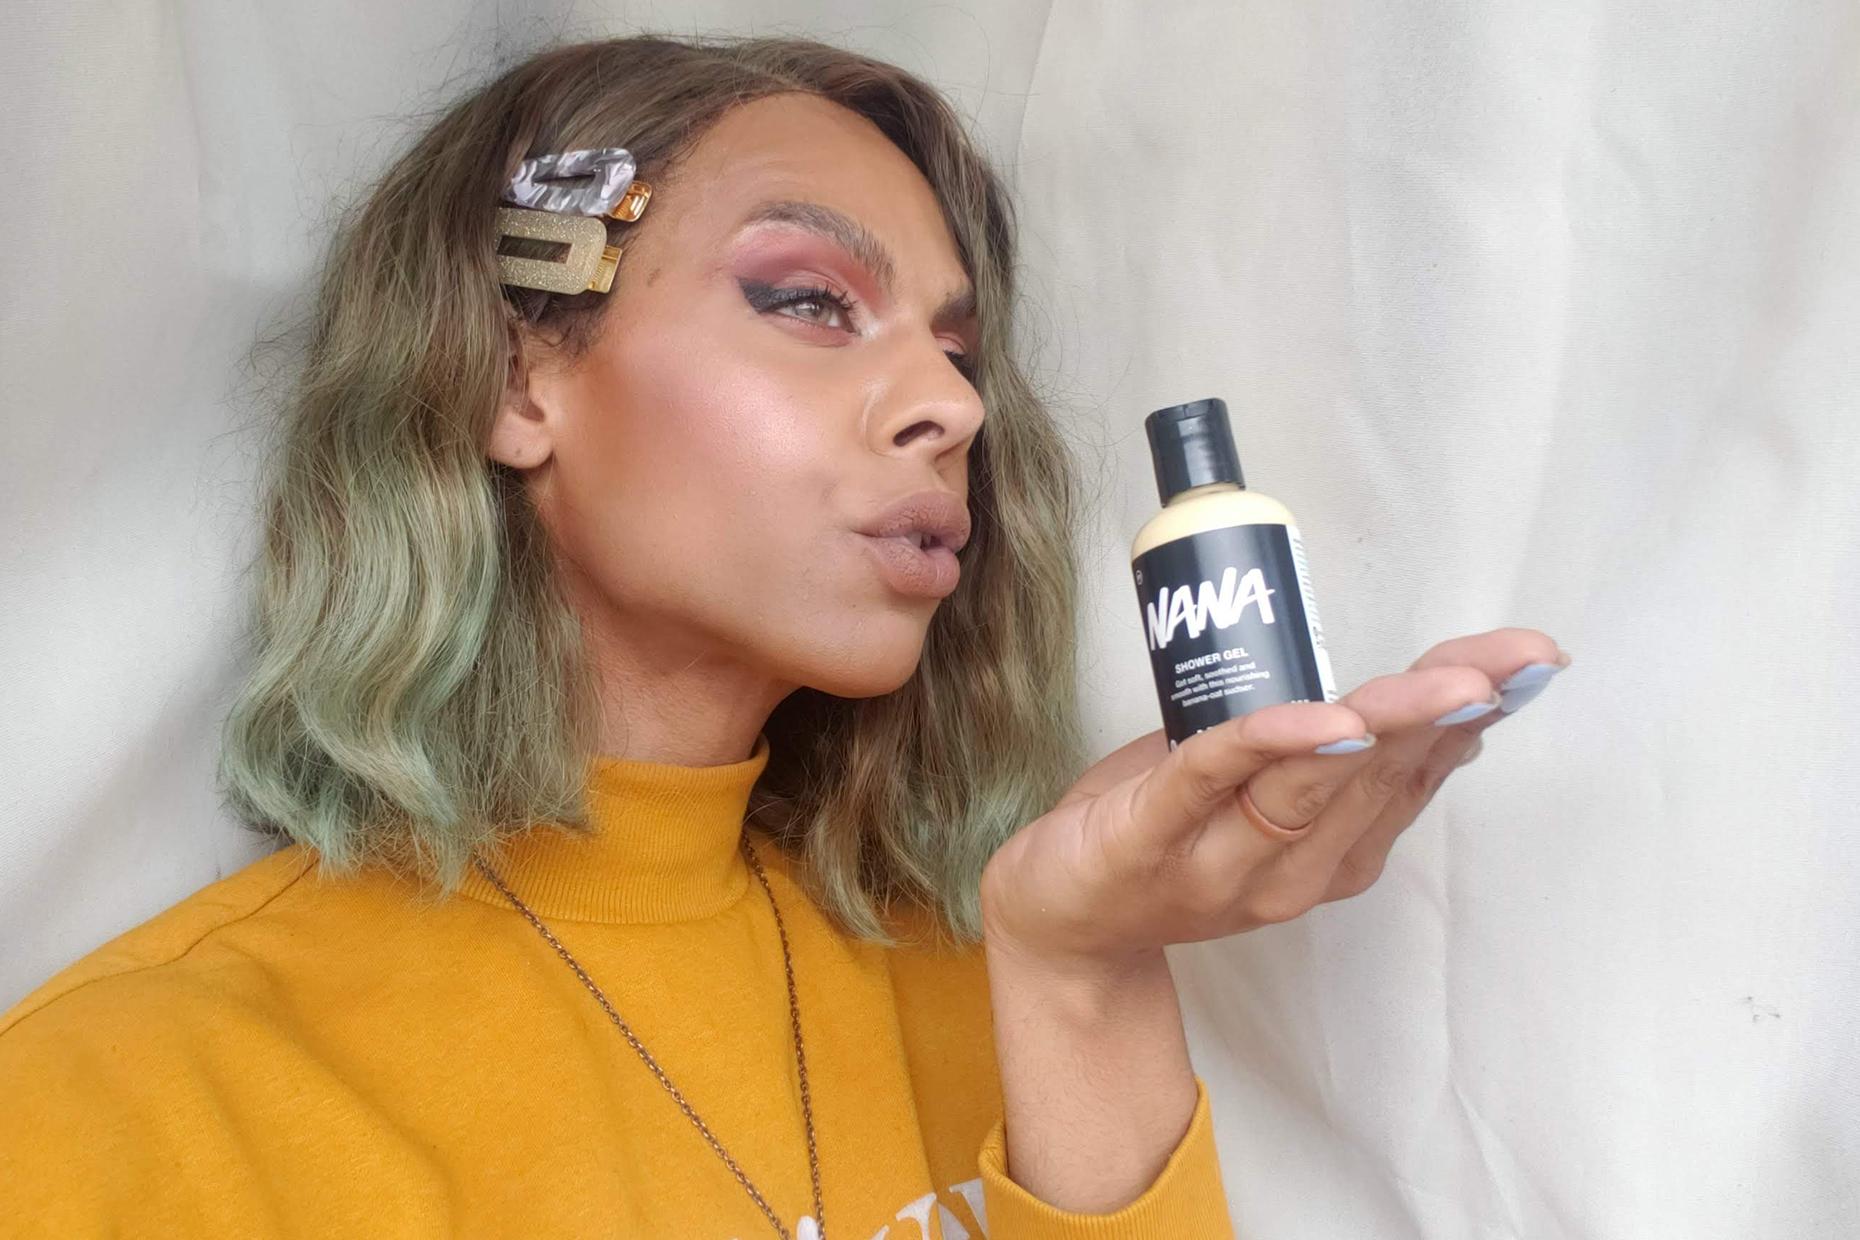 Anasteja holds a bottle of Nana Shower Gel.